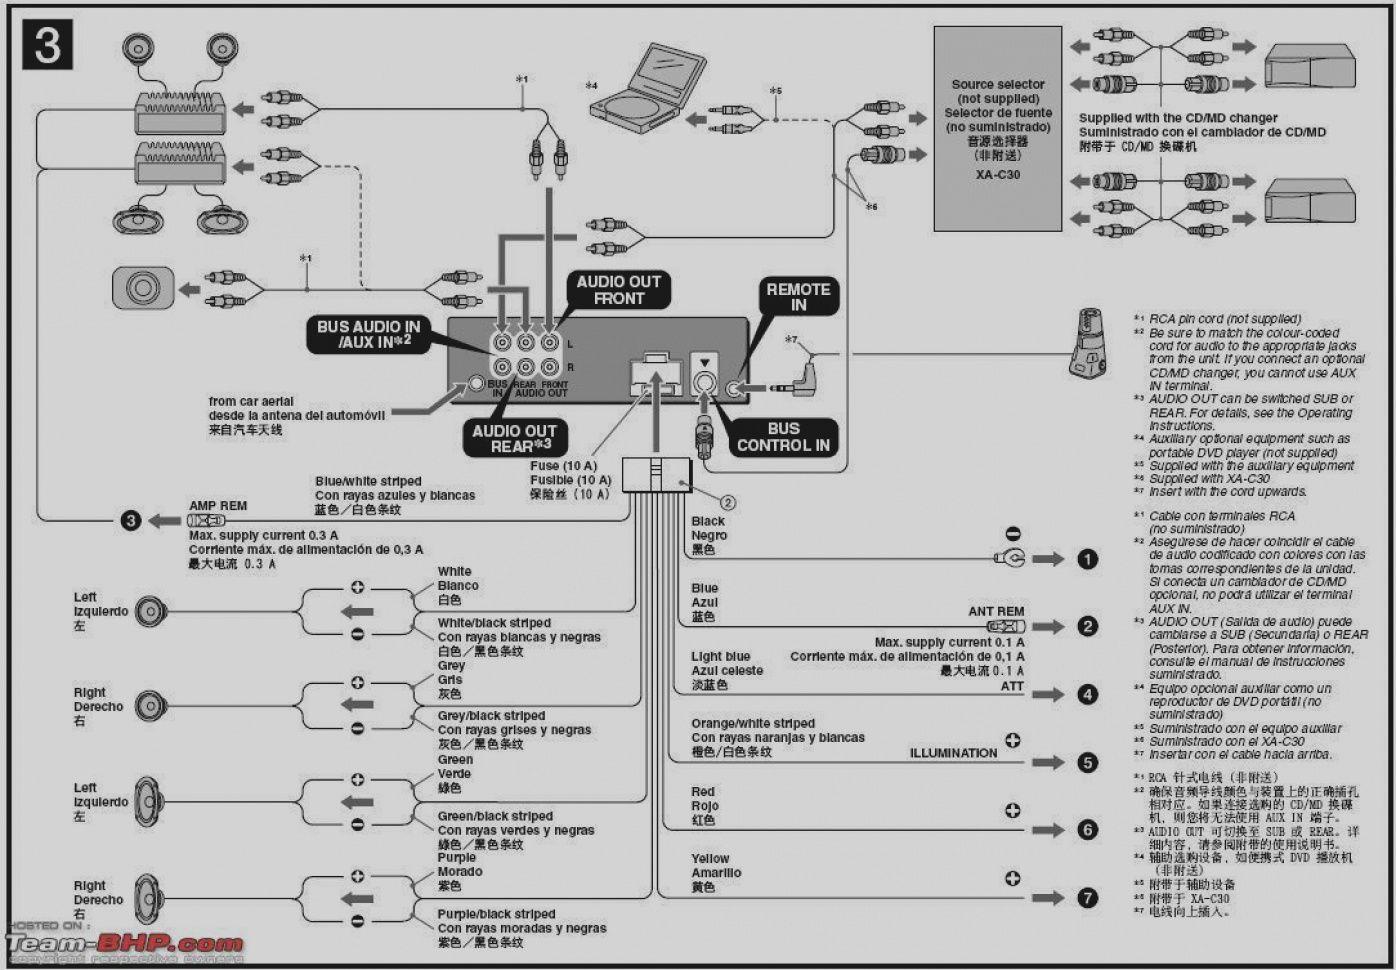 Wiring Diagram For Sony Xplod 52wx4